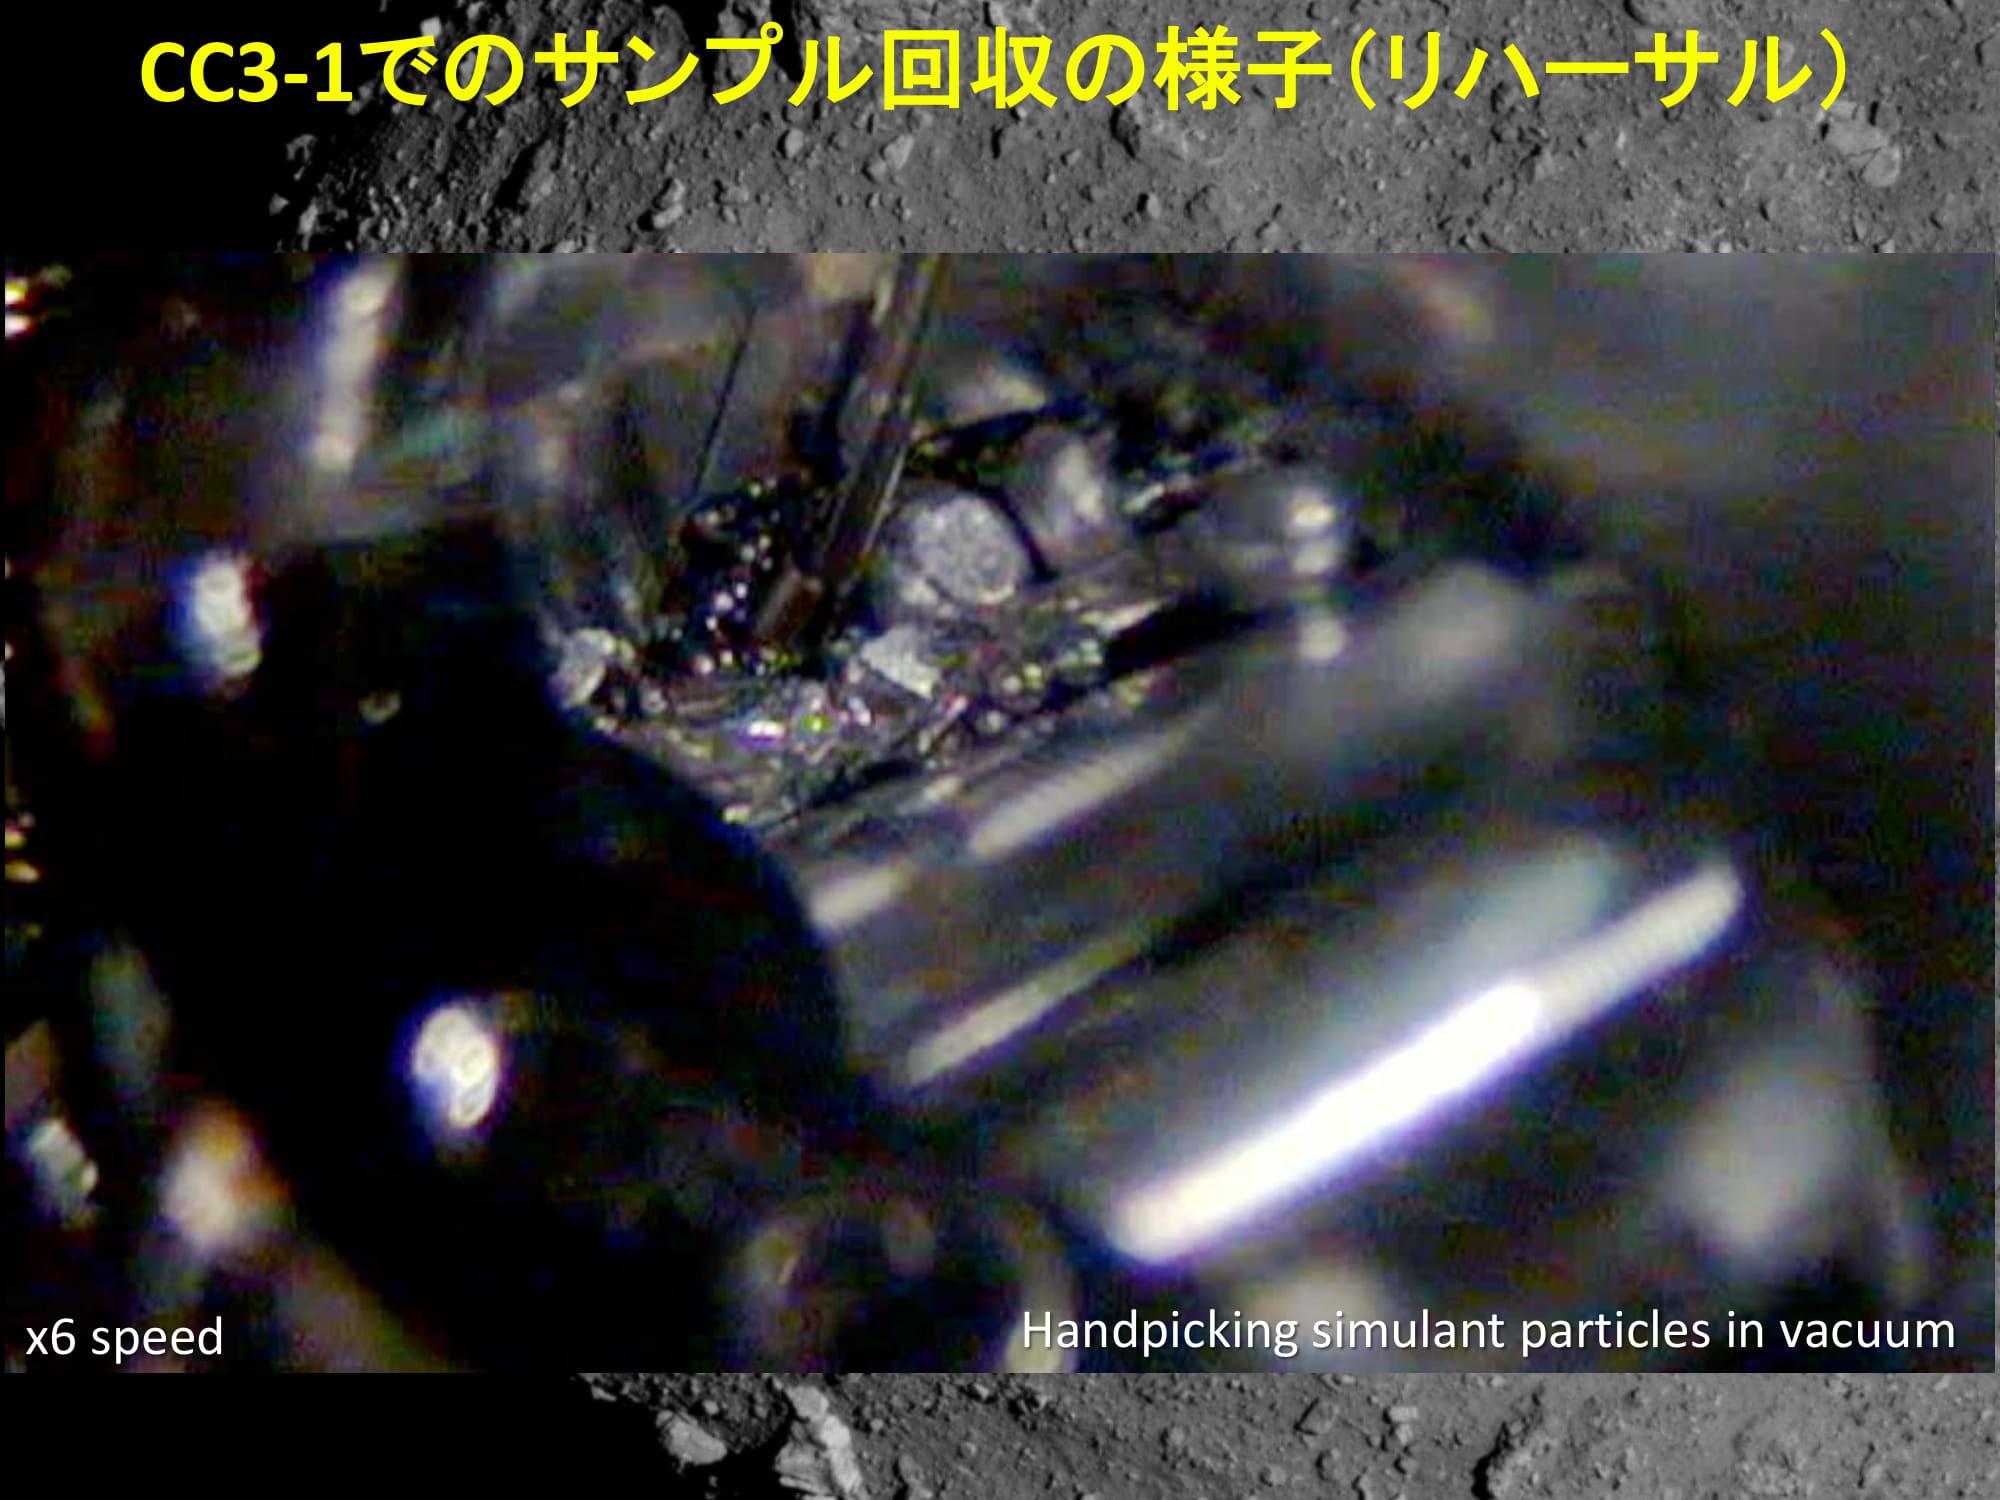 f:id:Imamura:20201208123036j:plain